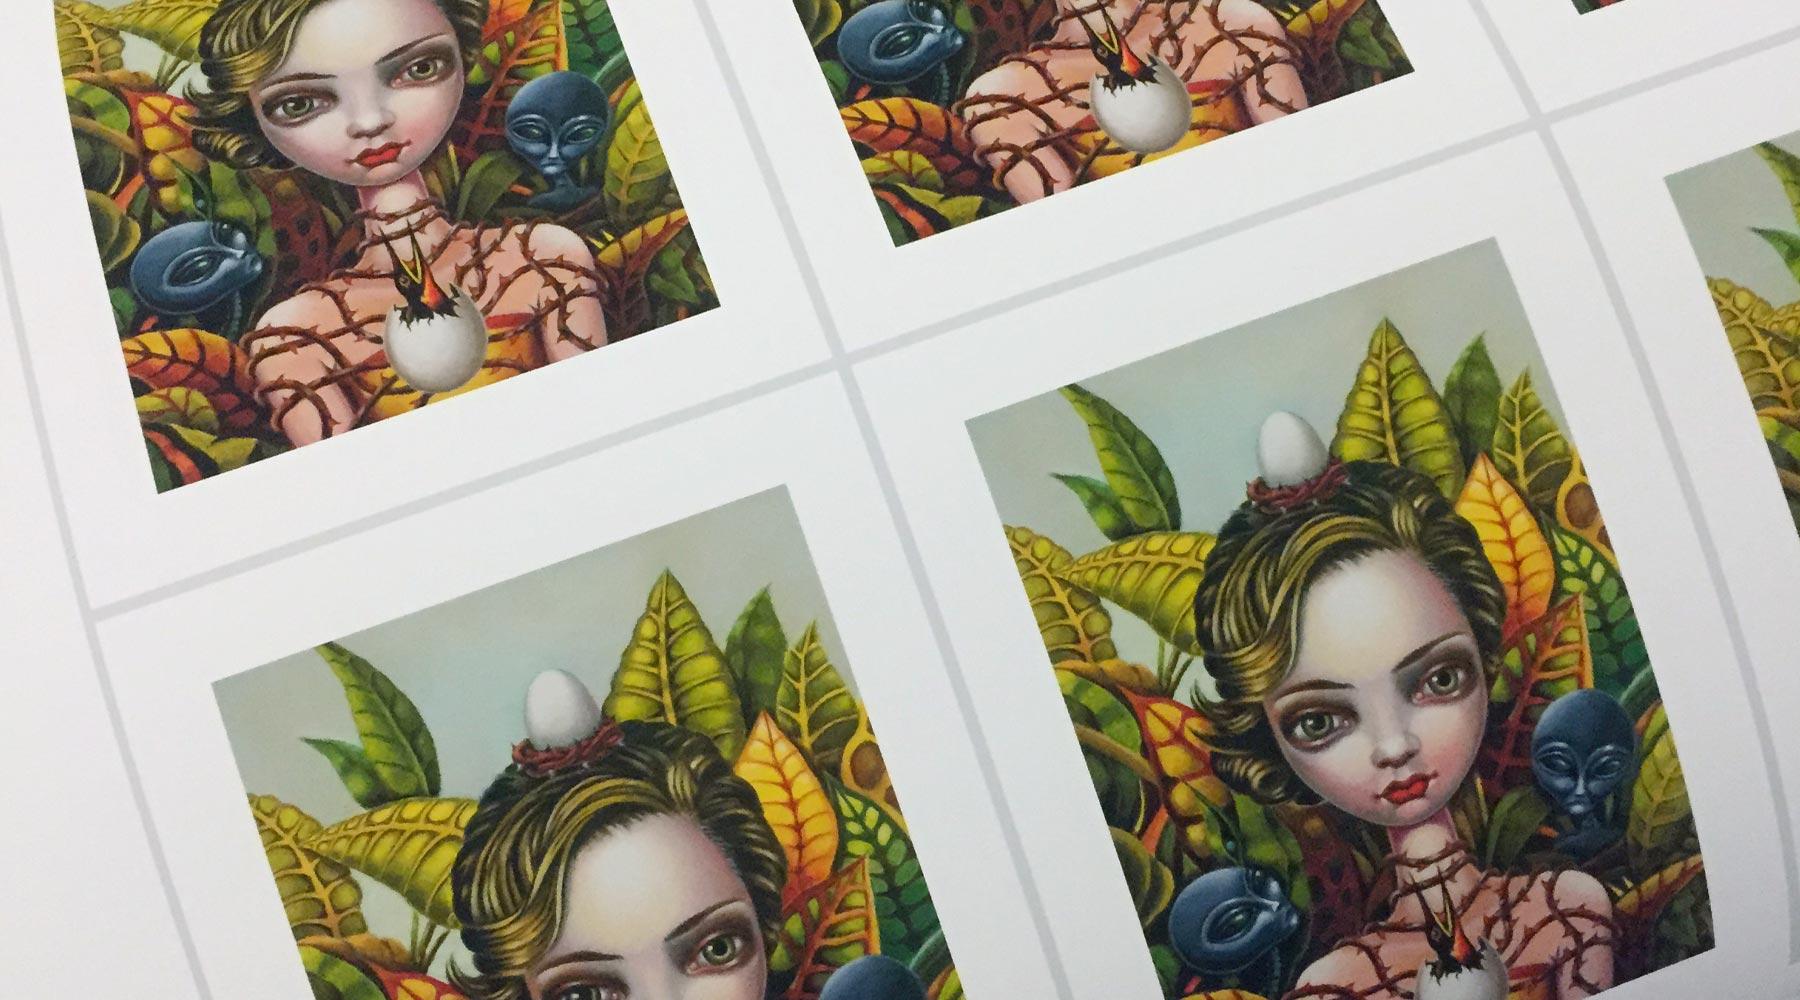 PrintframeStudio-slide-show14.jpg